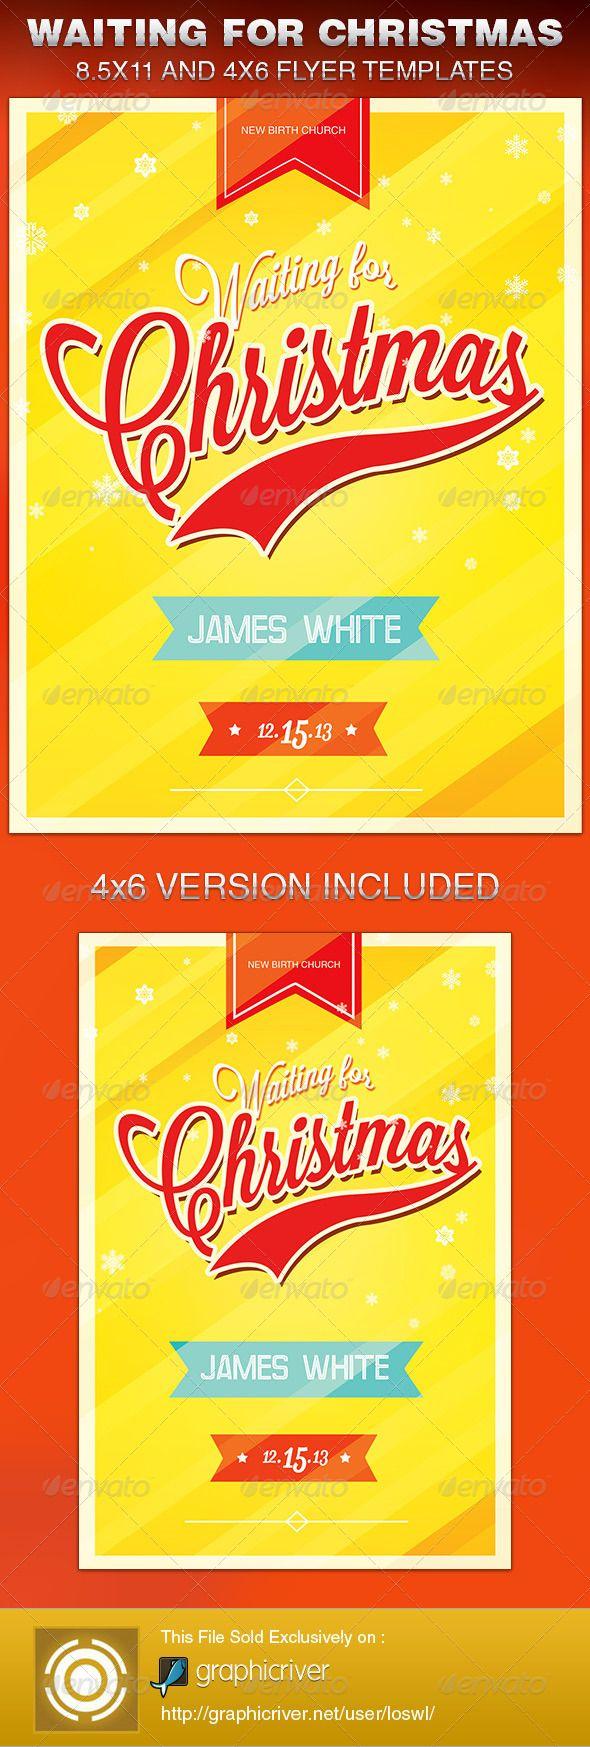 4x6 flyer template